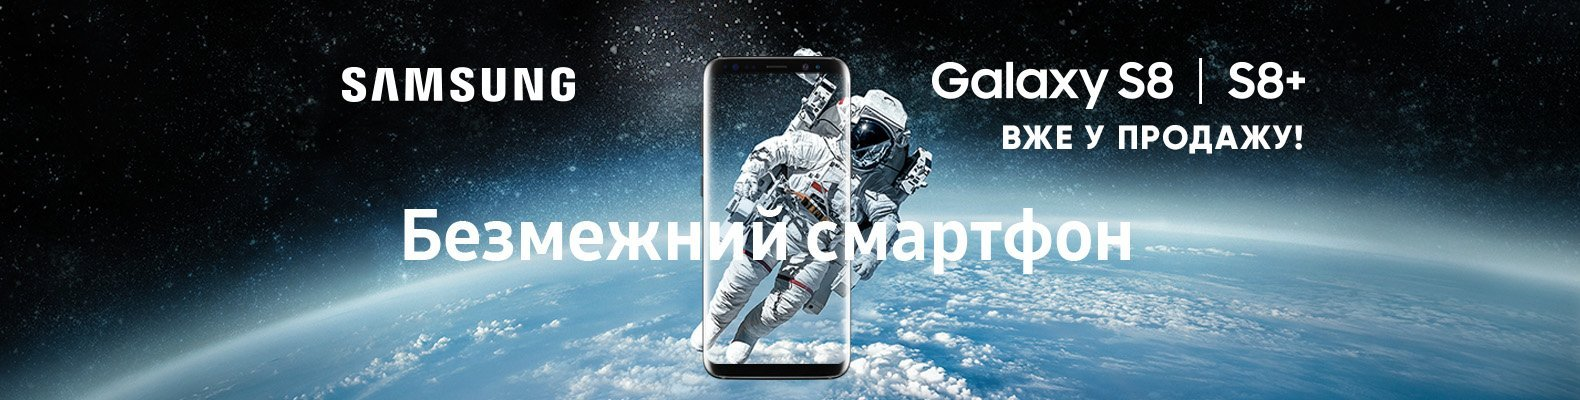 Samsung S8 Предзаказ